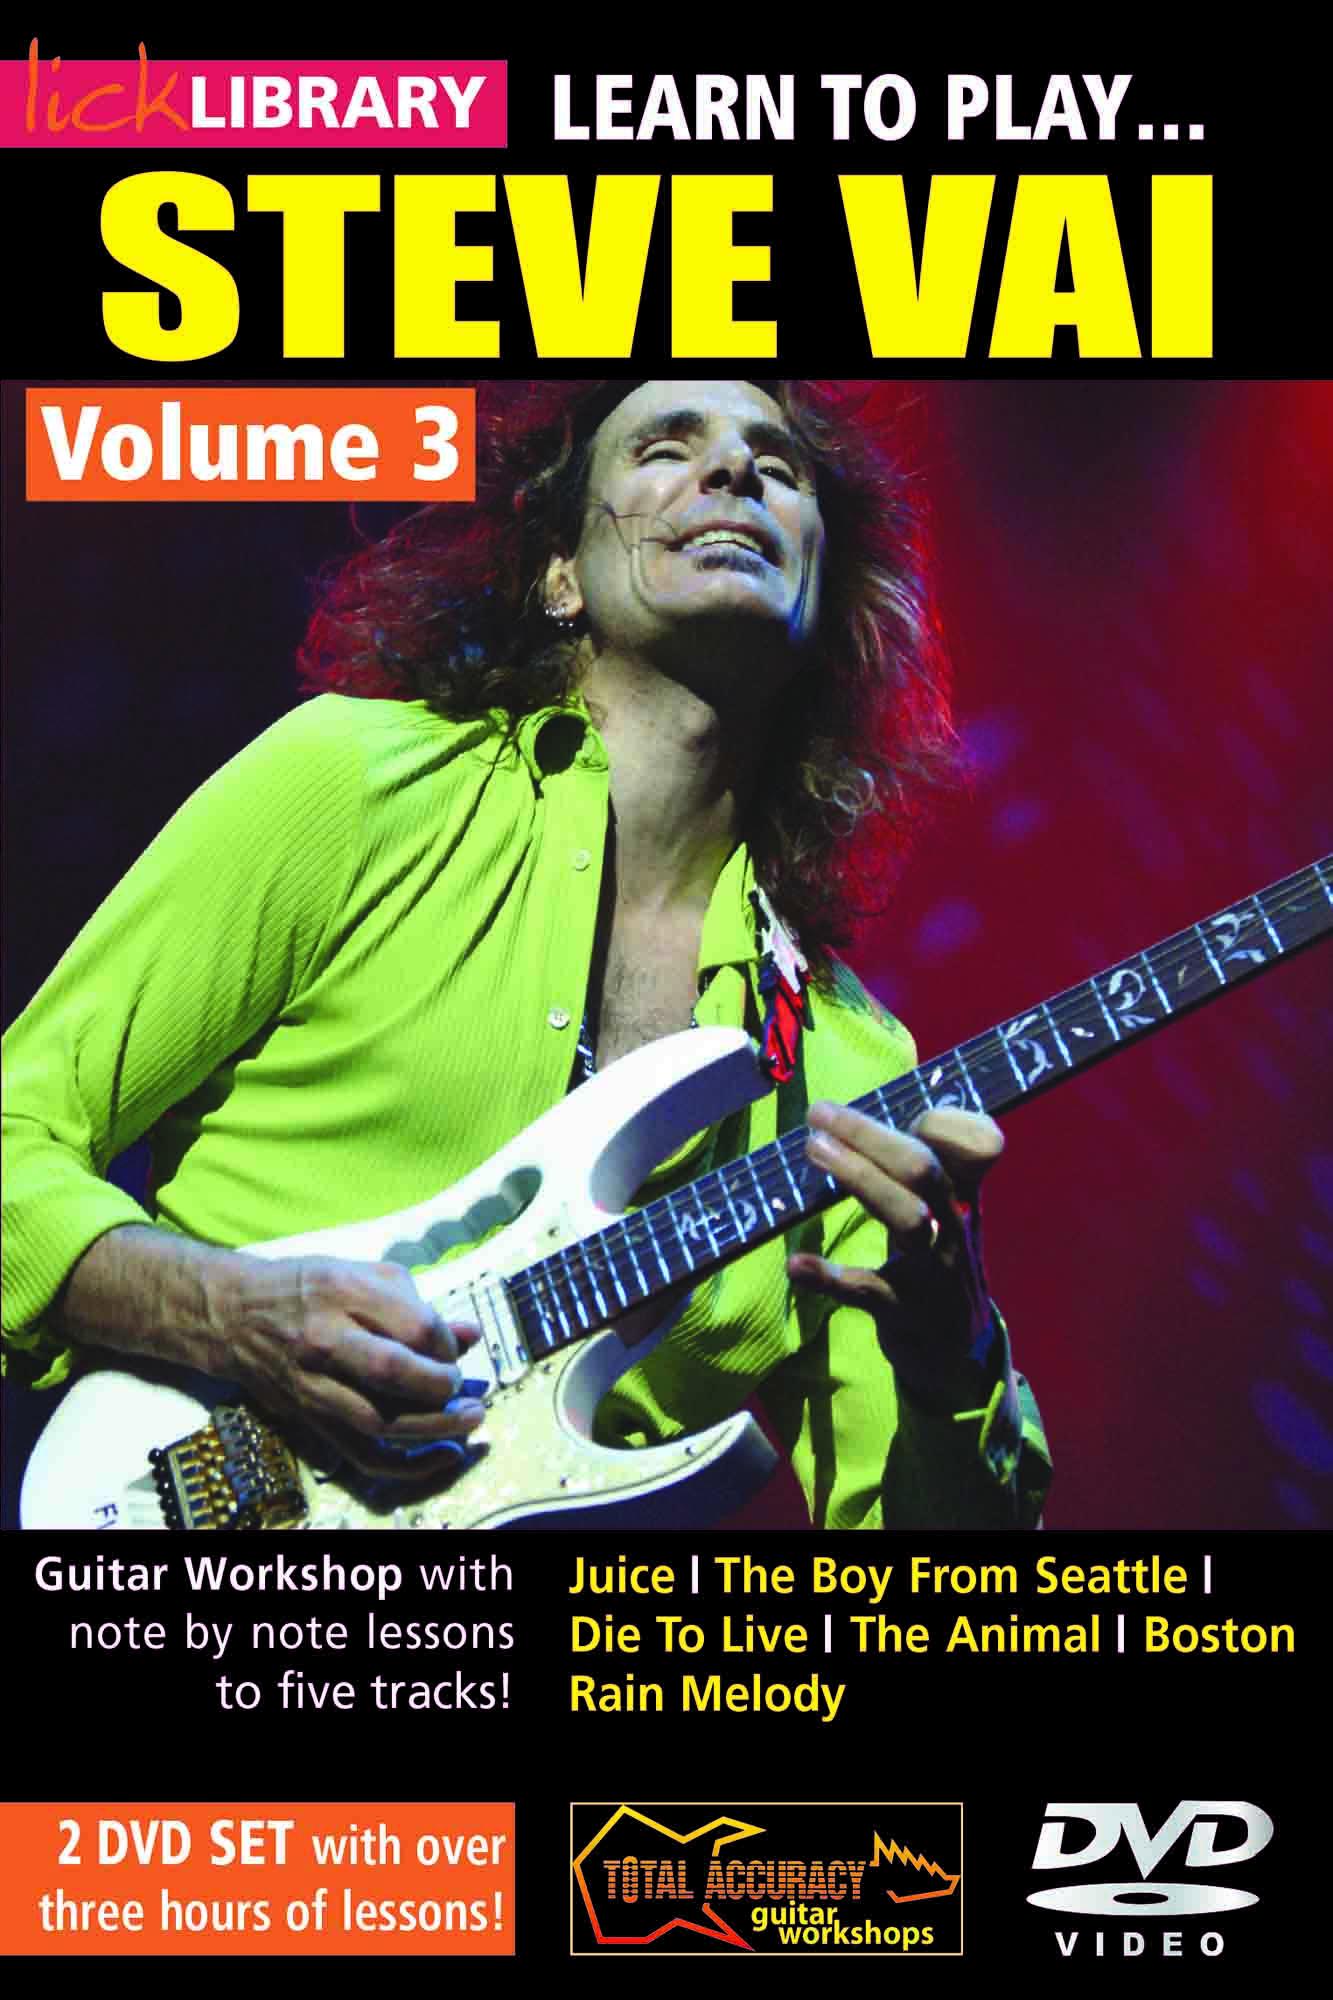 Learn To Play Steve Vai Volume 3